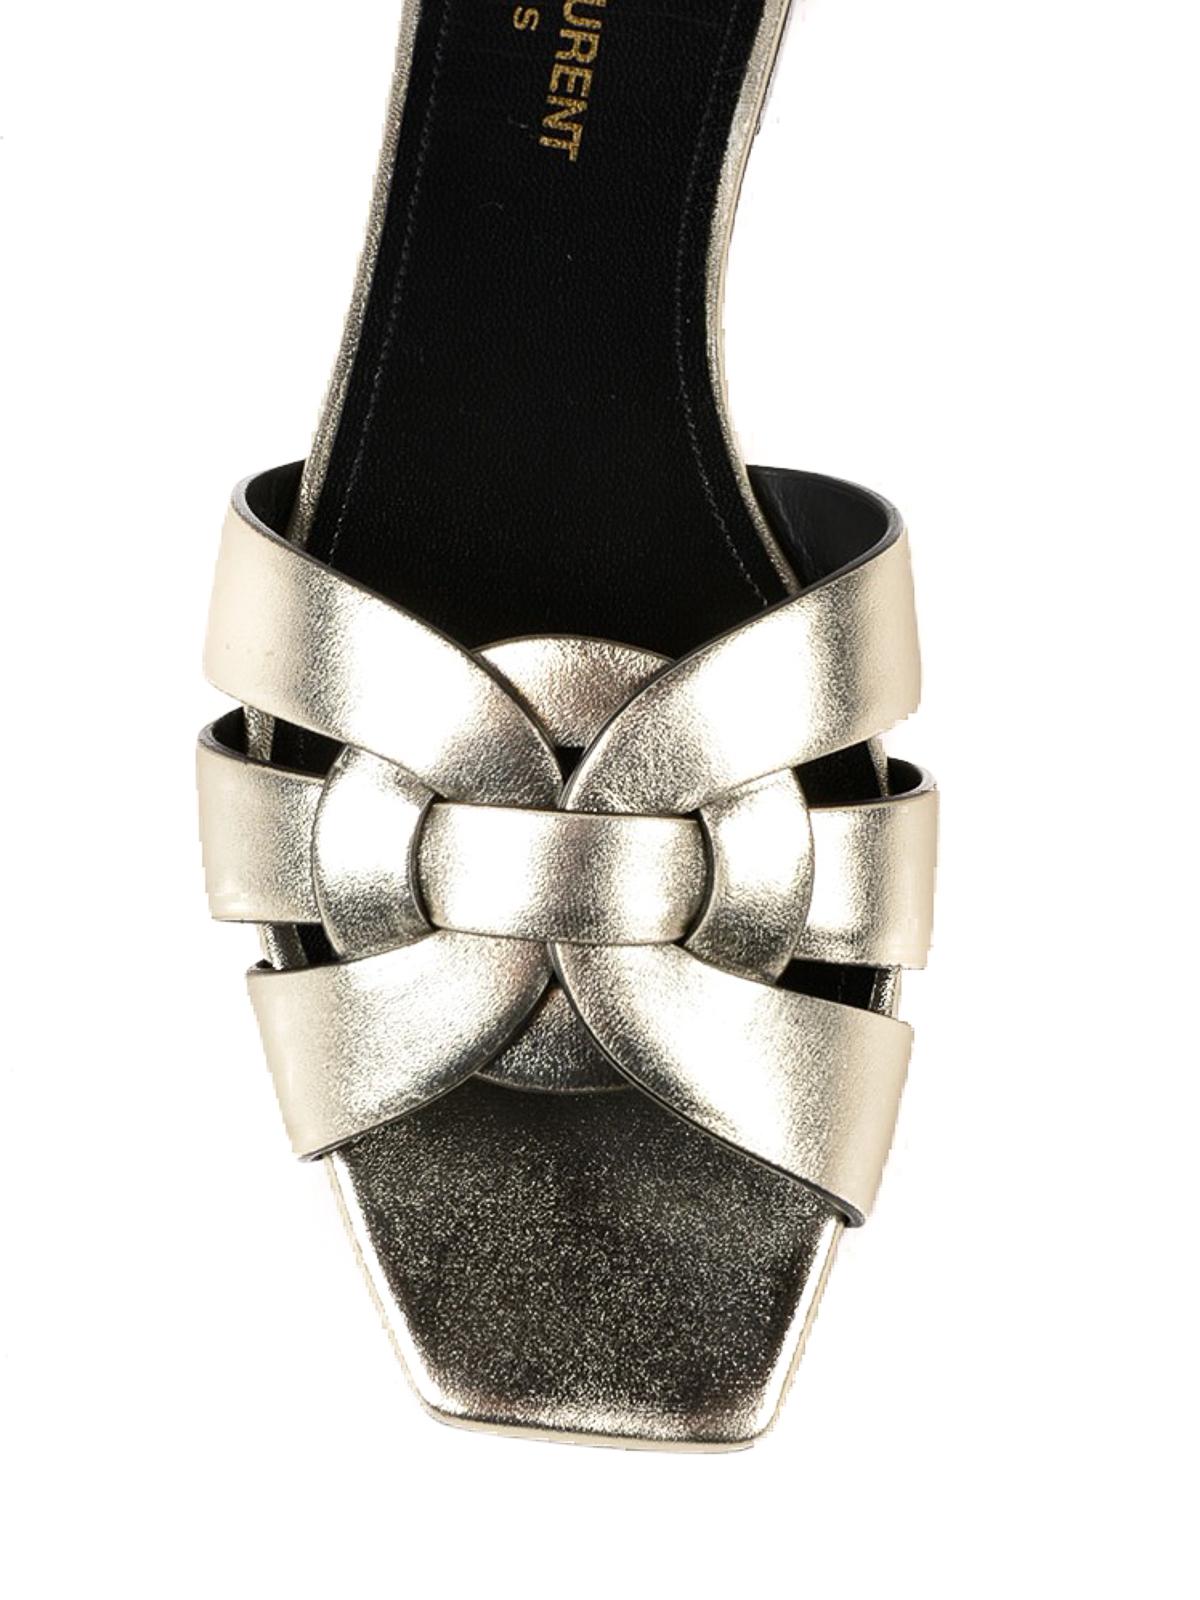 af225059183 Saint Laurent - Nu Pieds Tribute flat slide sandals - sandals ...